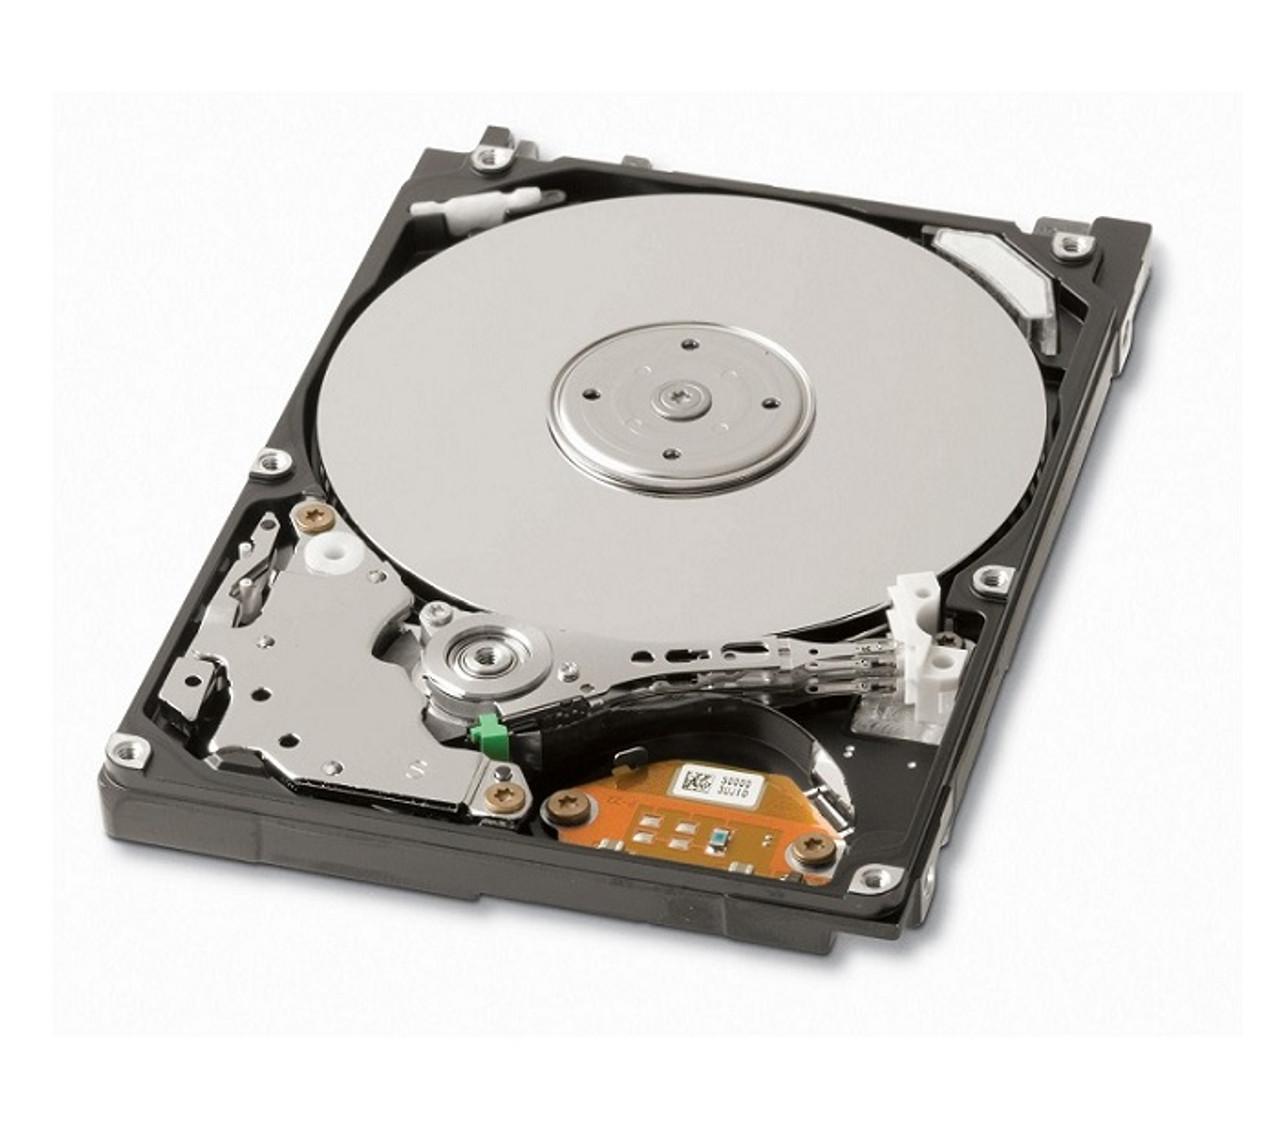 0S02607 - Hitachi IDK Travelstar 500GB 5400RPM SATA 3GB/s 8MB Cache 2.5-inch Hard Disk Drive